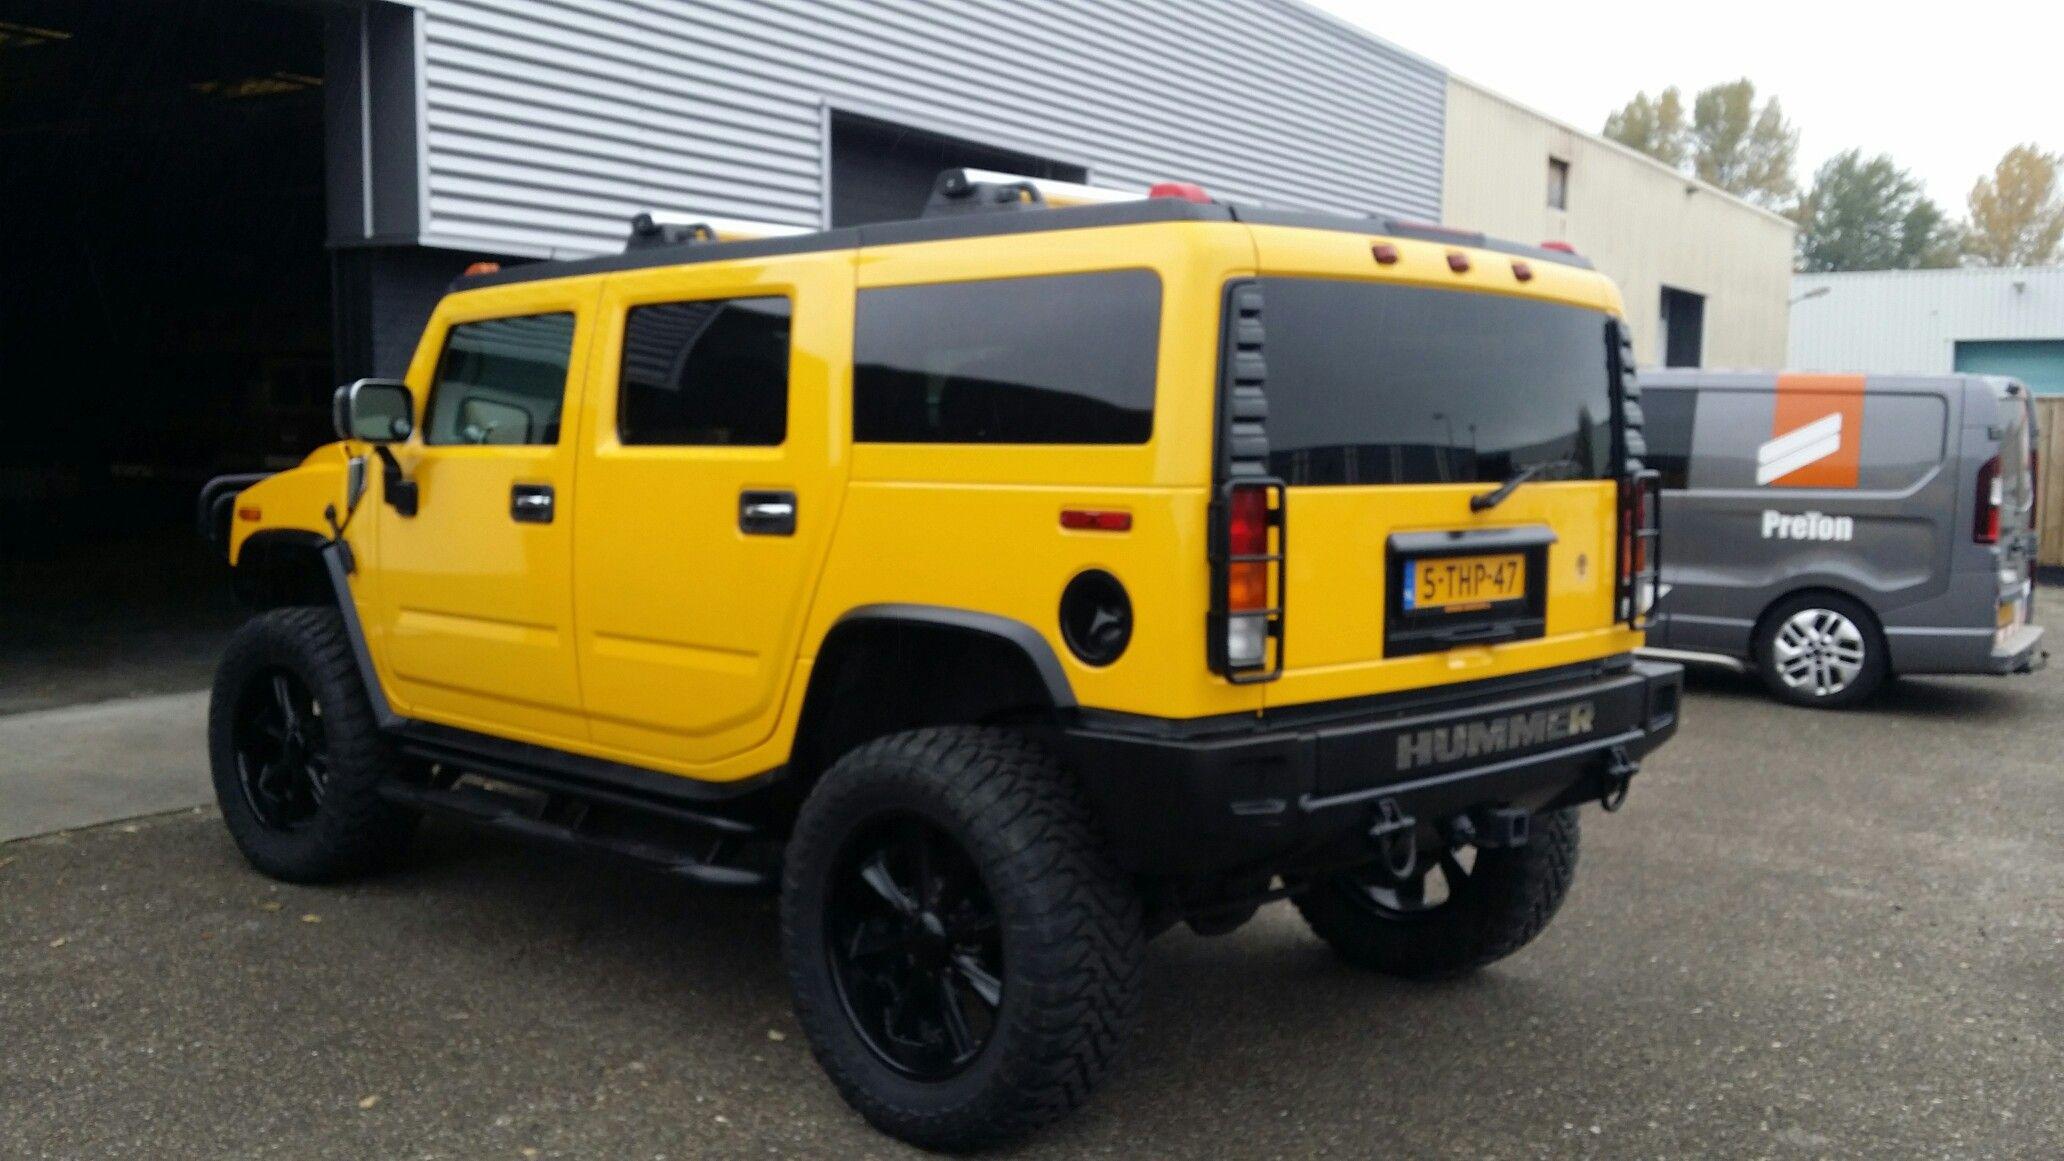 Hummer H2 yellow | CARS | Pinterest | Hummer h2, Hummer and Cars